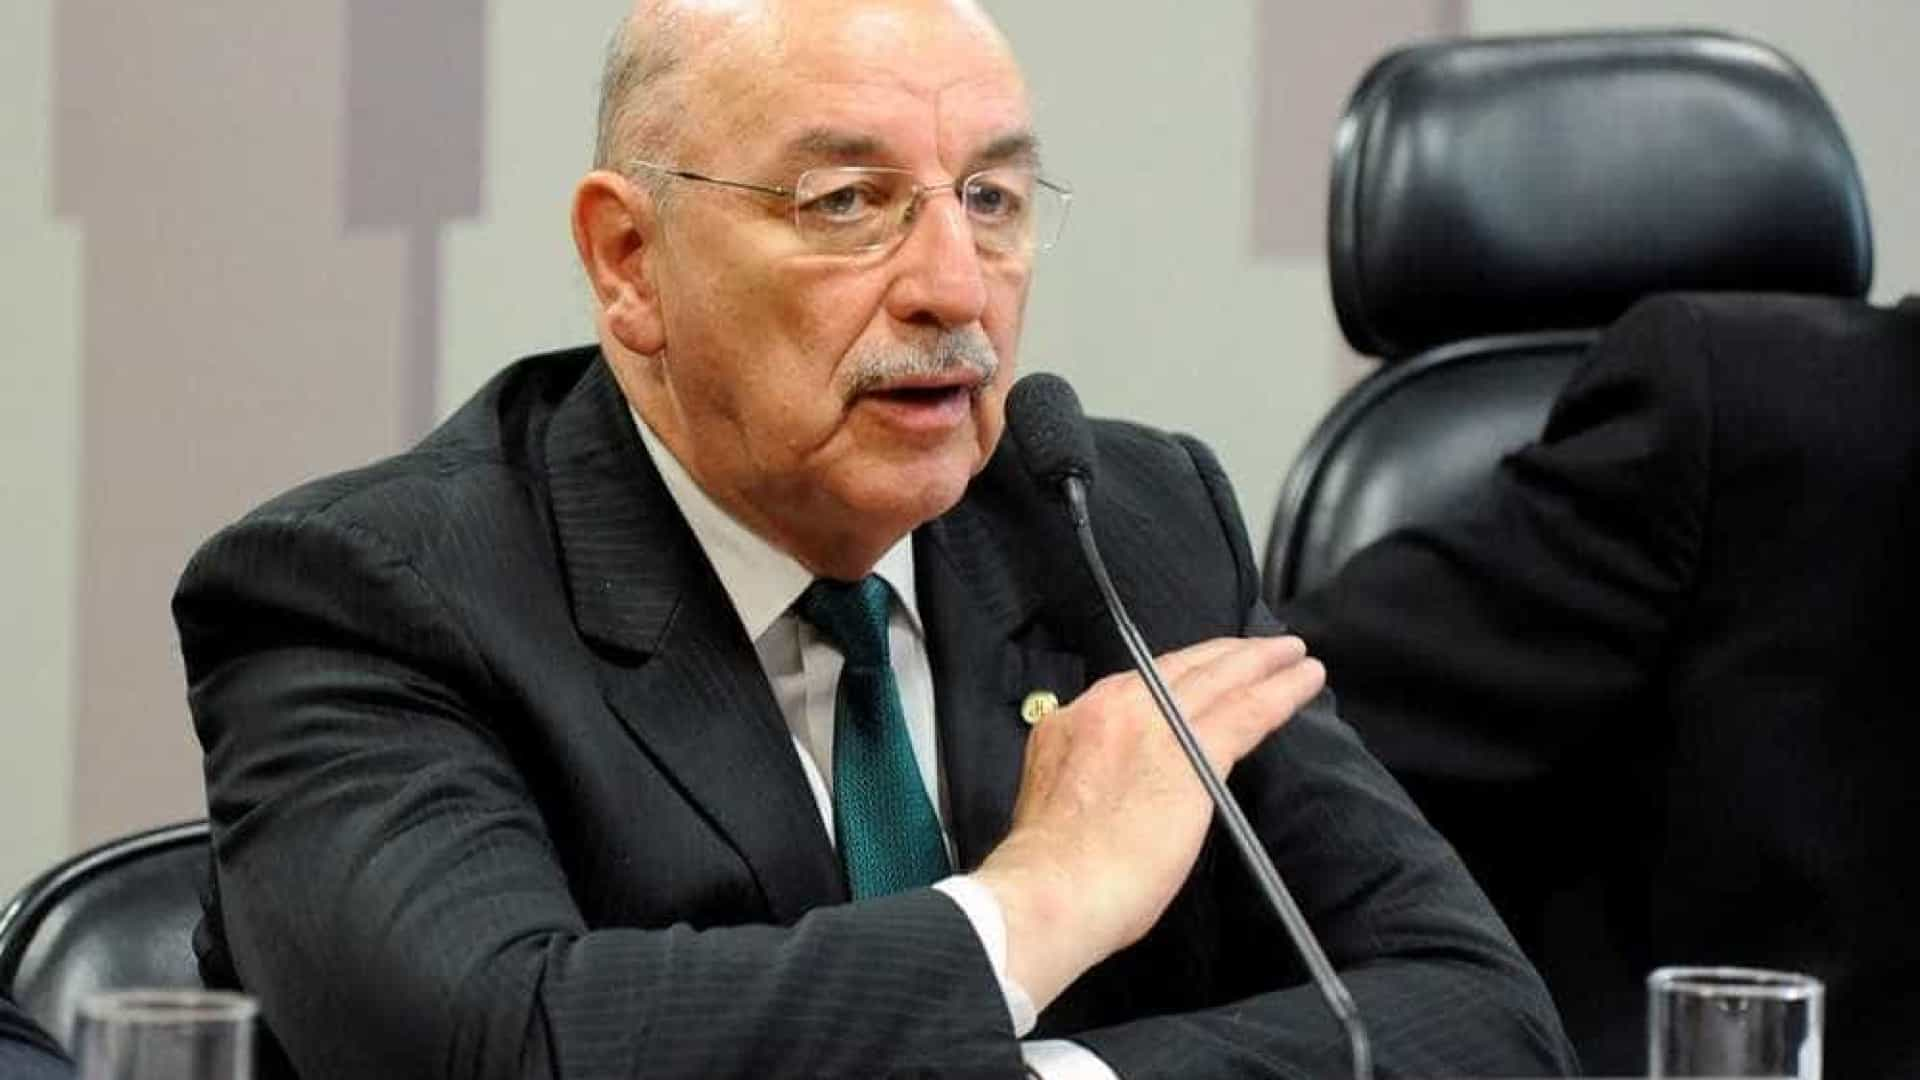 Ministro da Cidadania participa da posse do presidente da Argentina